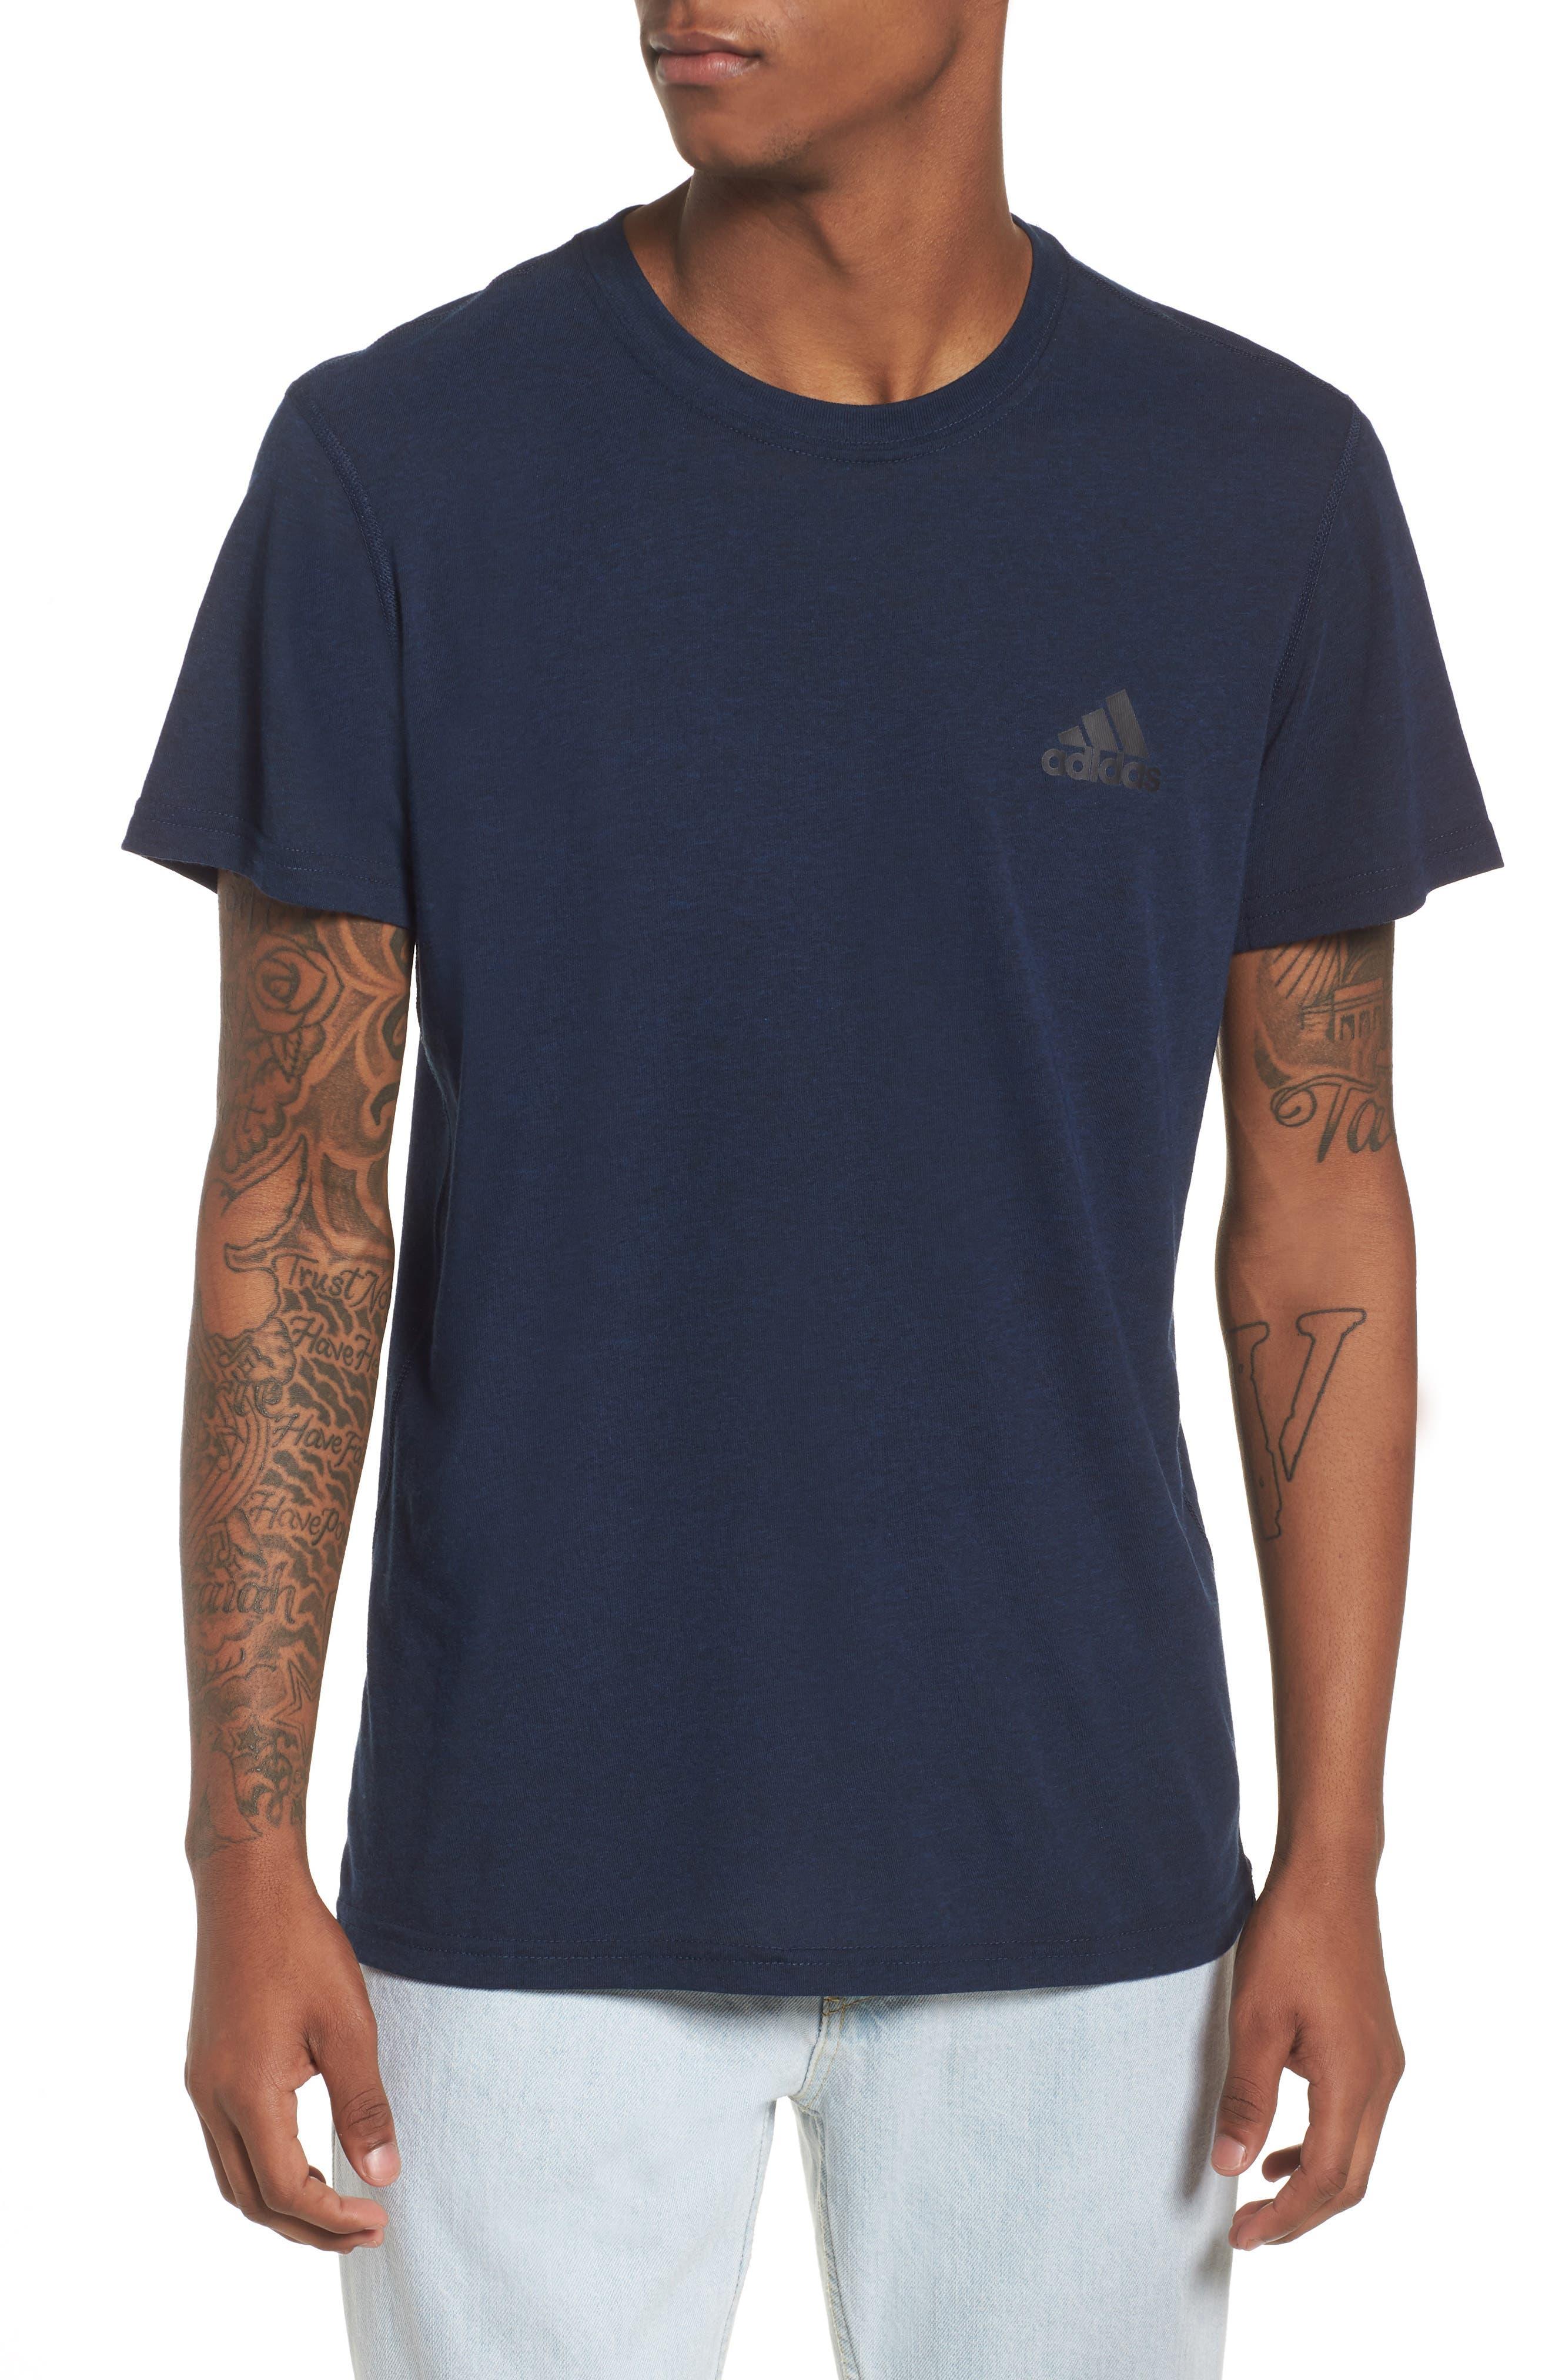 Ult Crewneck T-Shirt,                             Main thumbnail 1, color,                             002